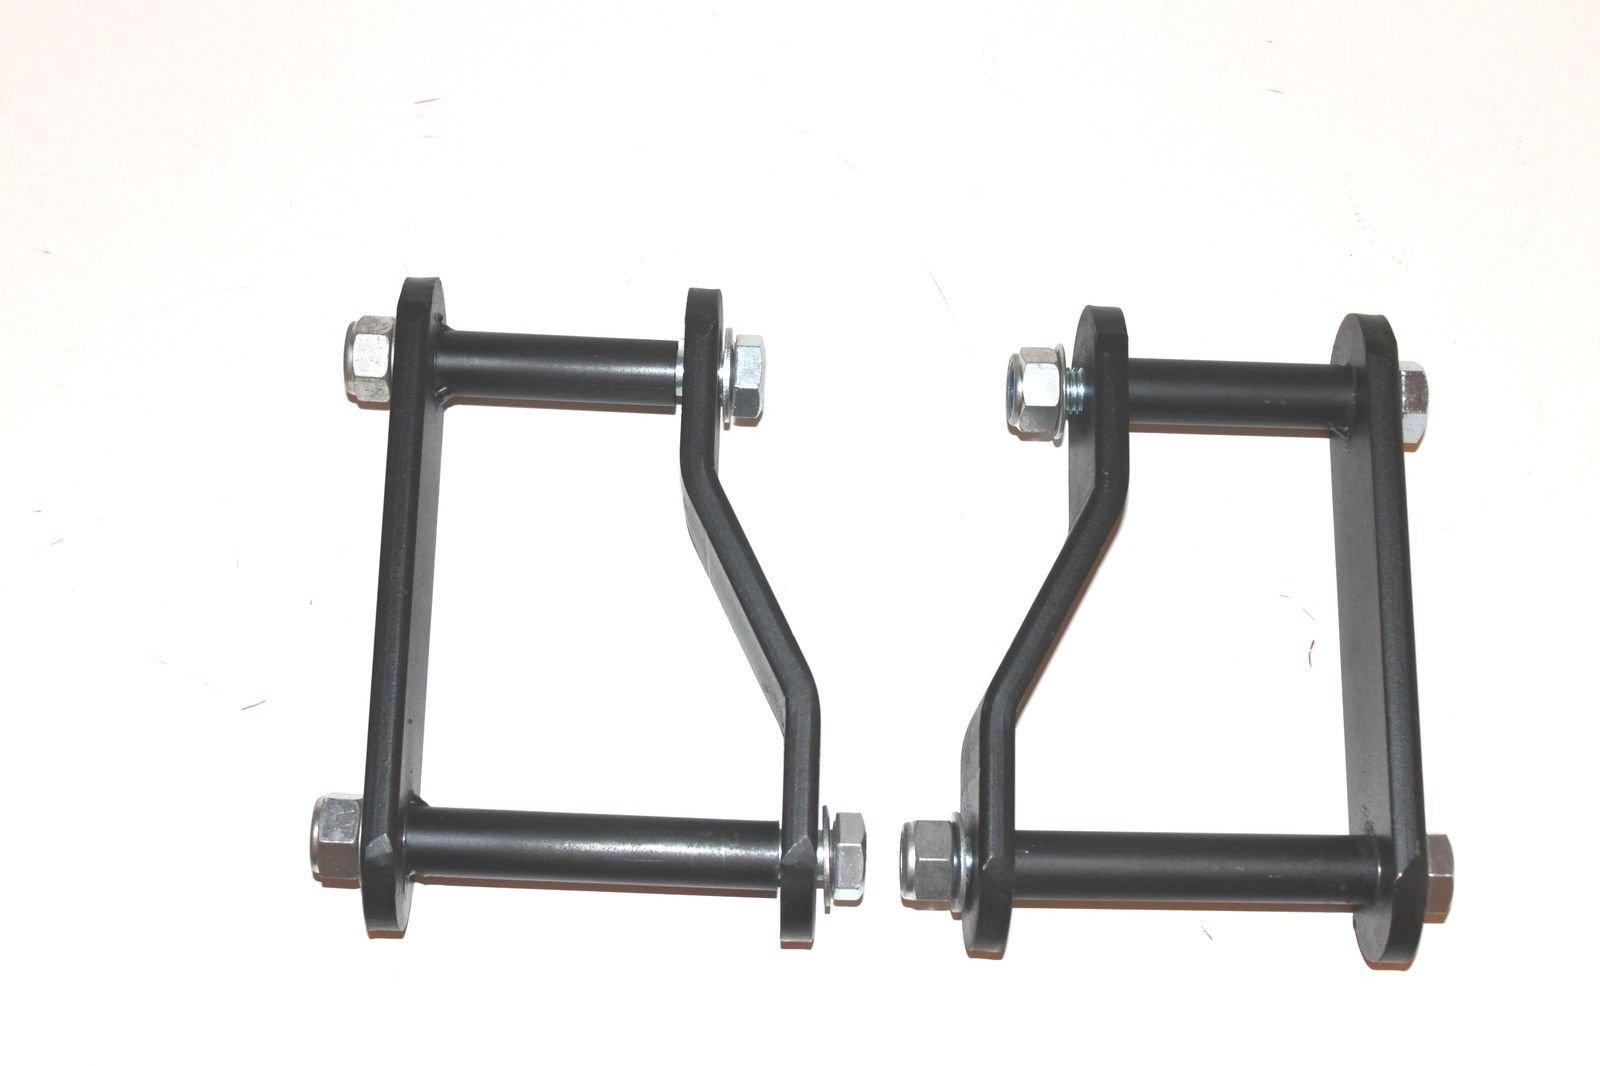 4 Rear Hanger /& Shackle Kit V8 Motor 2WD Fits Ford F150 Pickup Lowering Kit 2 Front Lowering Drop Coil Springs RTZ